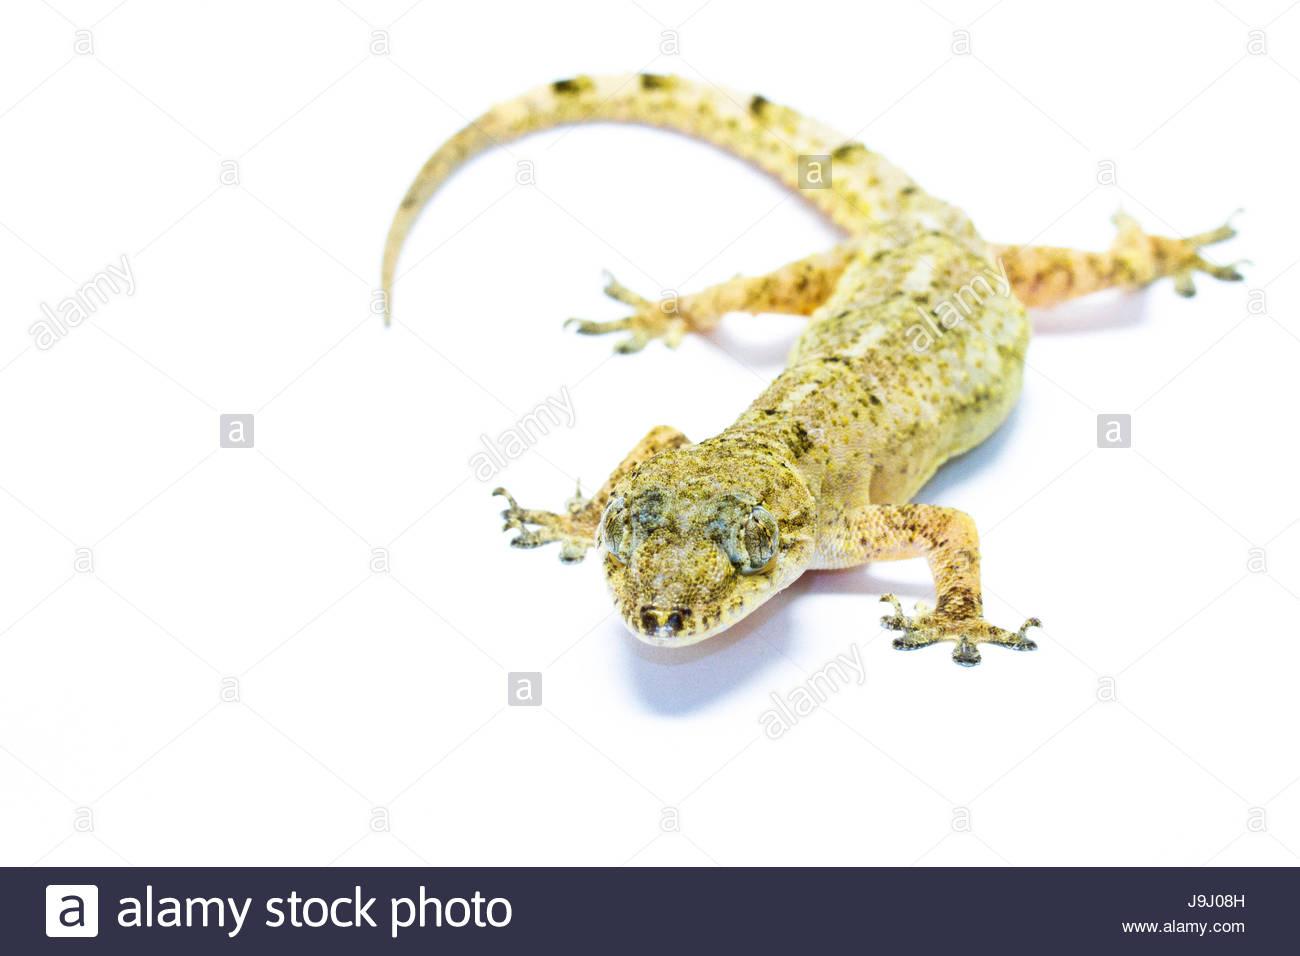 animal portrait of a tropical house gecko, hemidactylus mabouia